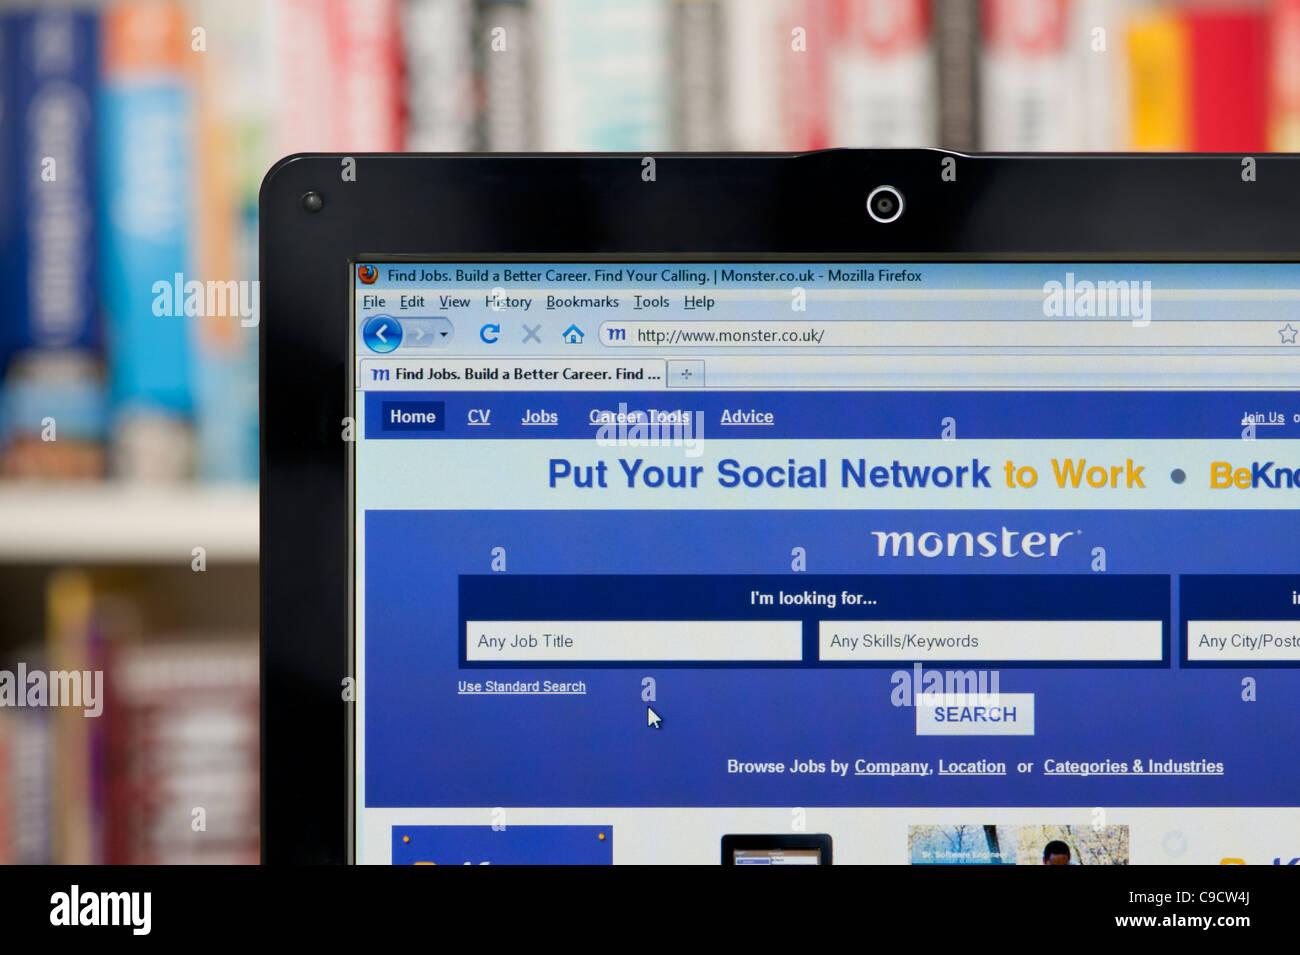 Online Job Search Monster.com Stock Photos & Online Job Search ...